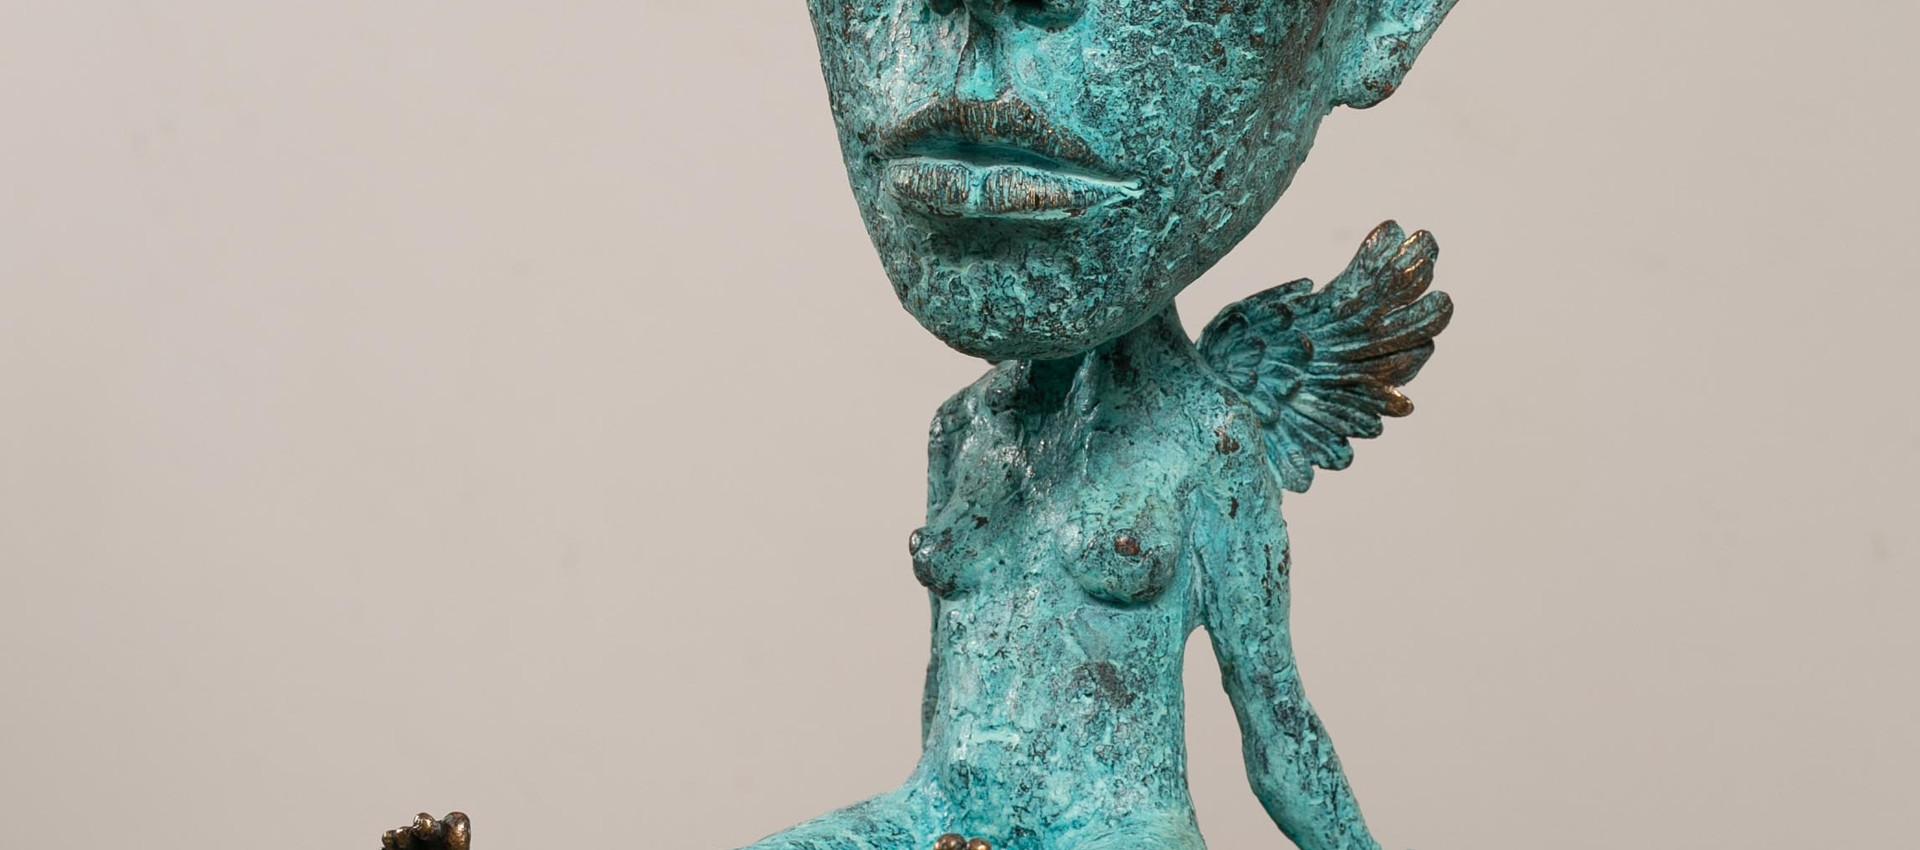 Alina Bachurina. Gnossienne III, 2020, bronze, stone, 46х32 cm